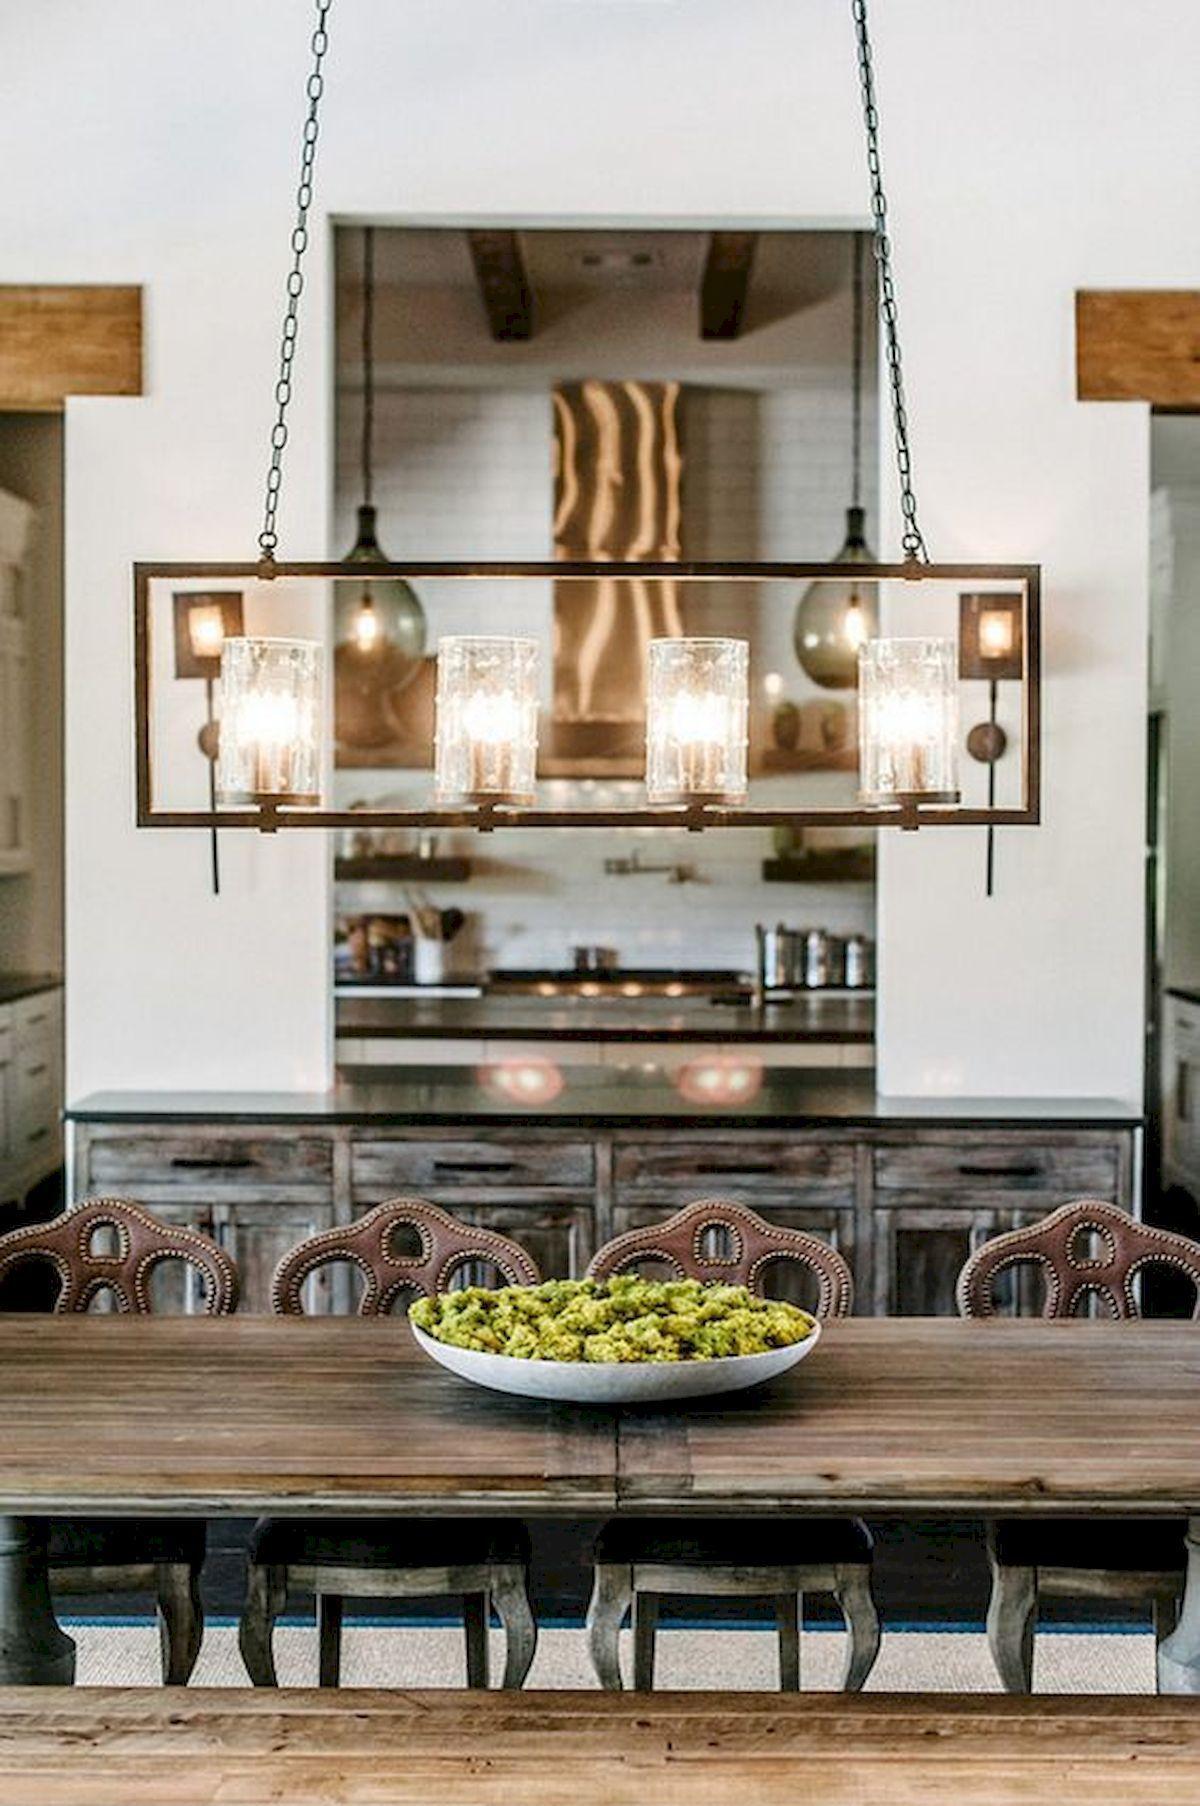 2019 Best Farmhouse Lighting Design Ideas And Decor 41 Worldecor Co Farmhouse Dining Room Lighting Rustic Dining Room Lighting Farmhouse Lighting Dining